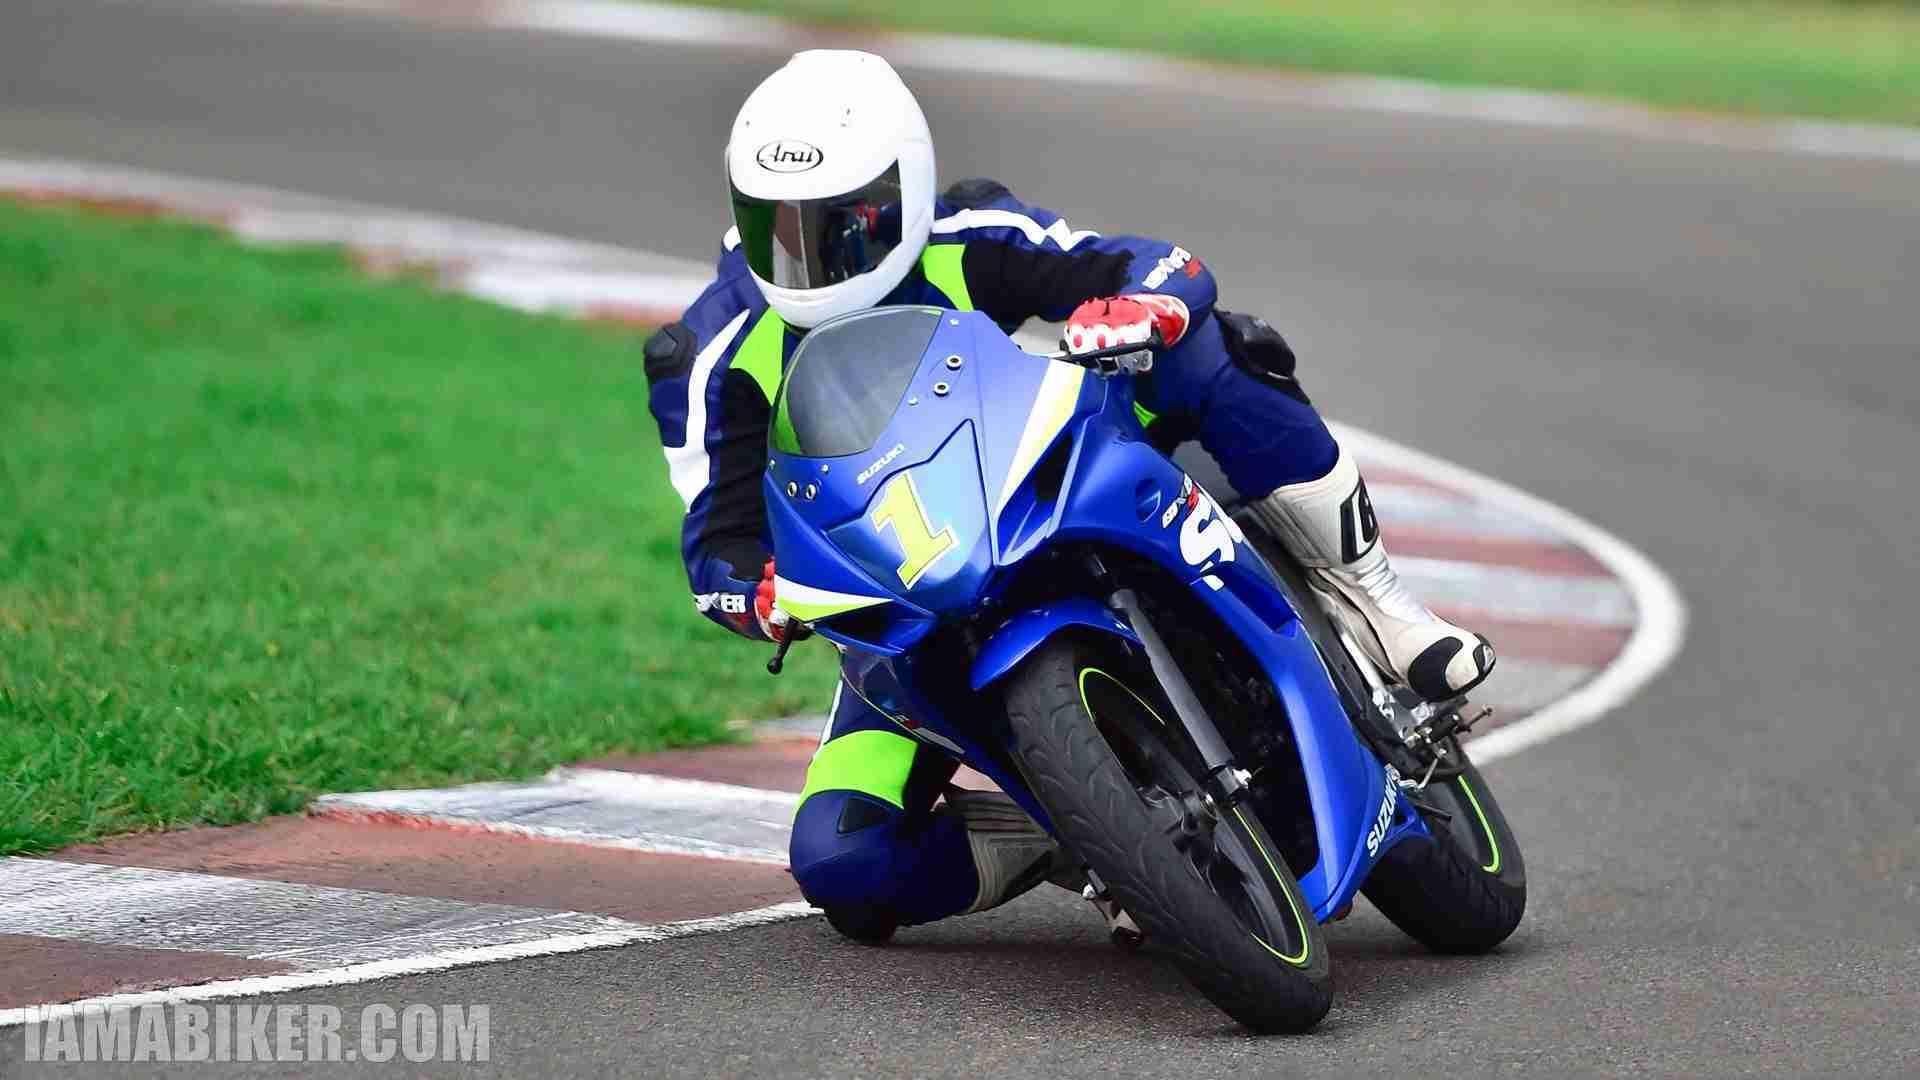 Suzuki announces 'Gixxer Cup' Championship